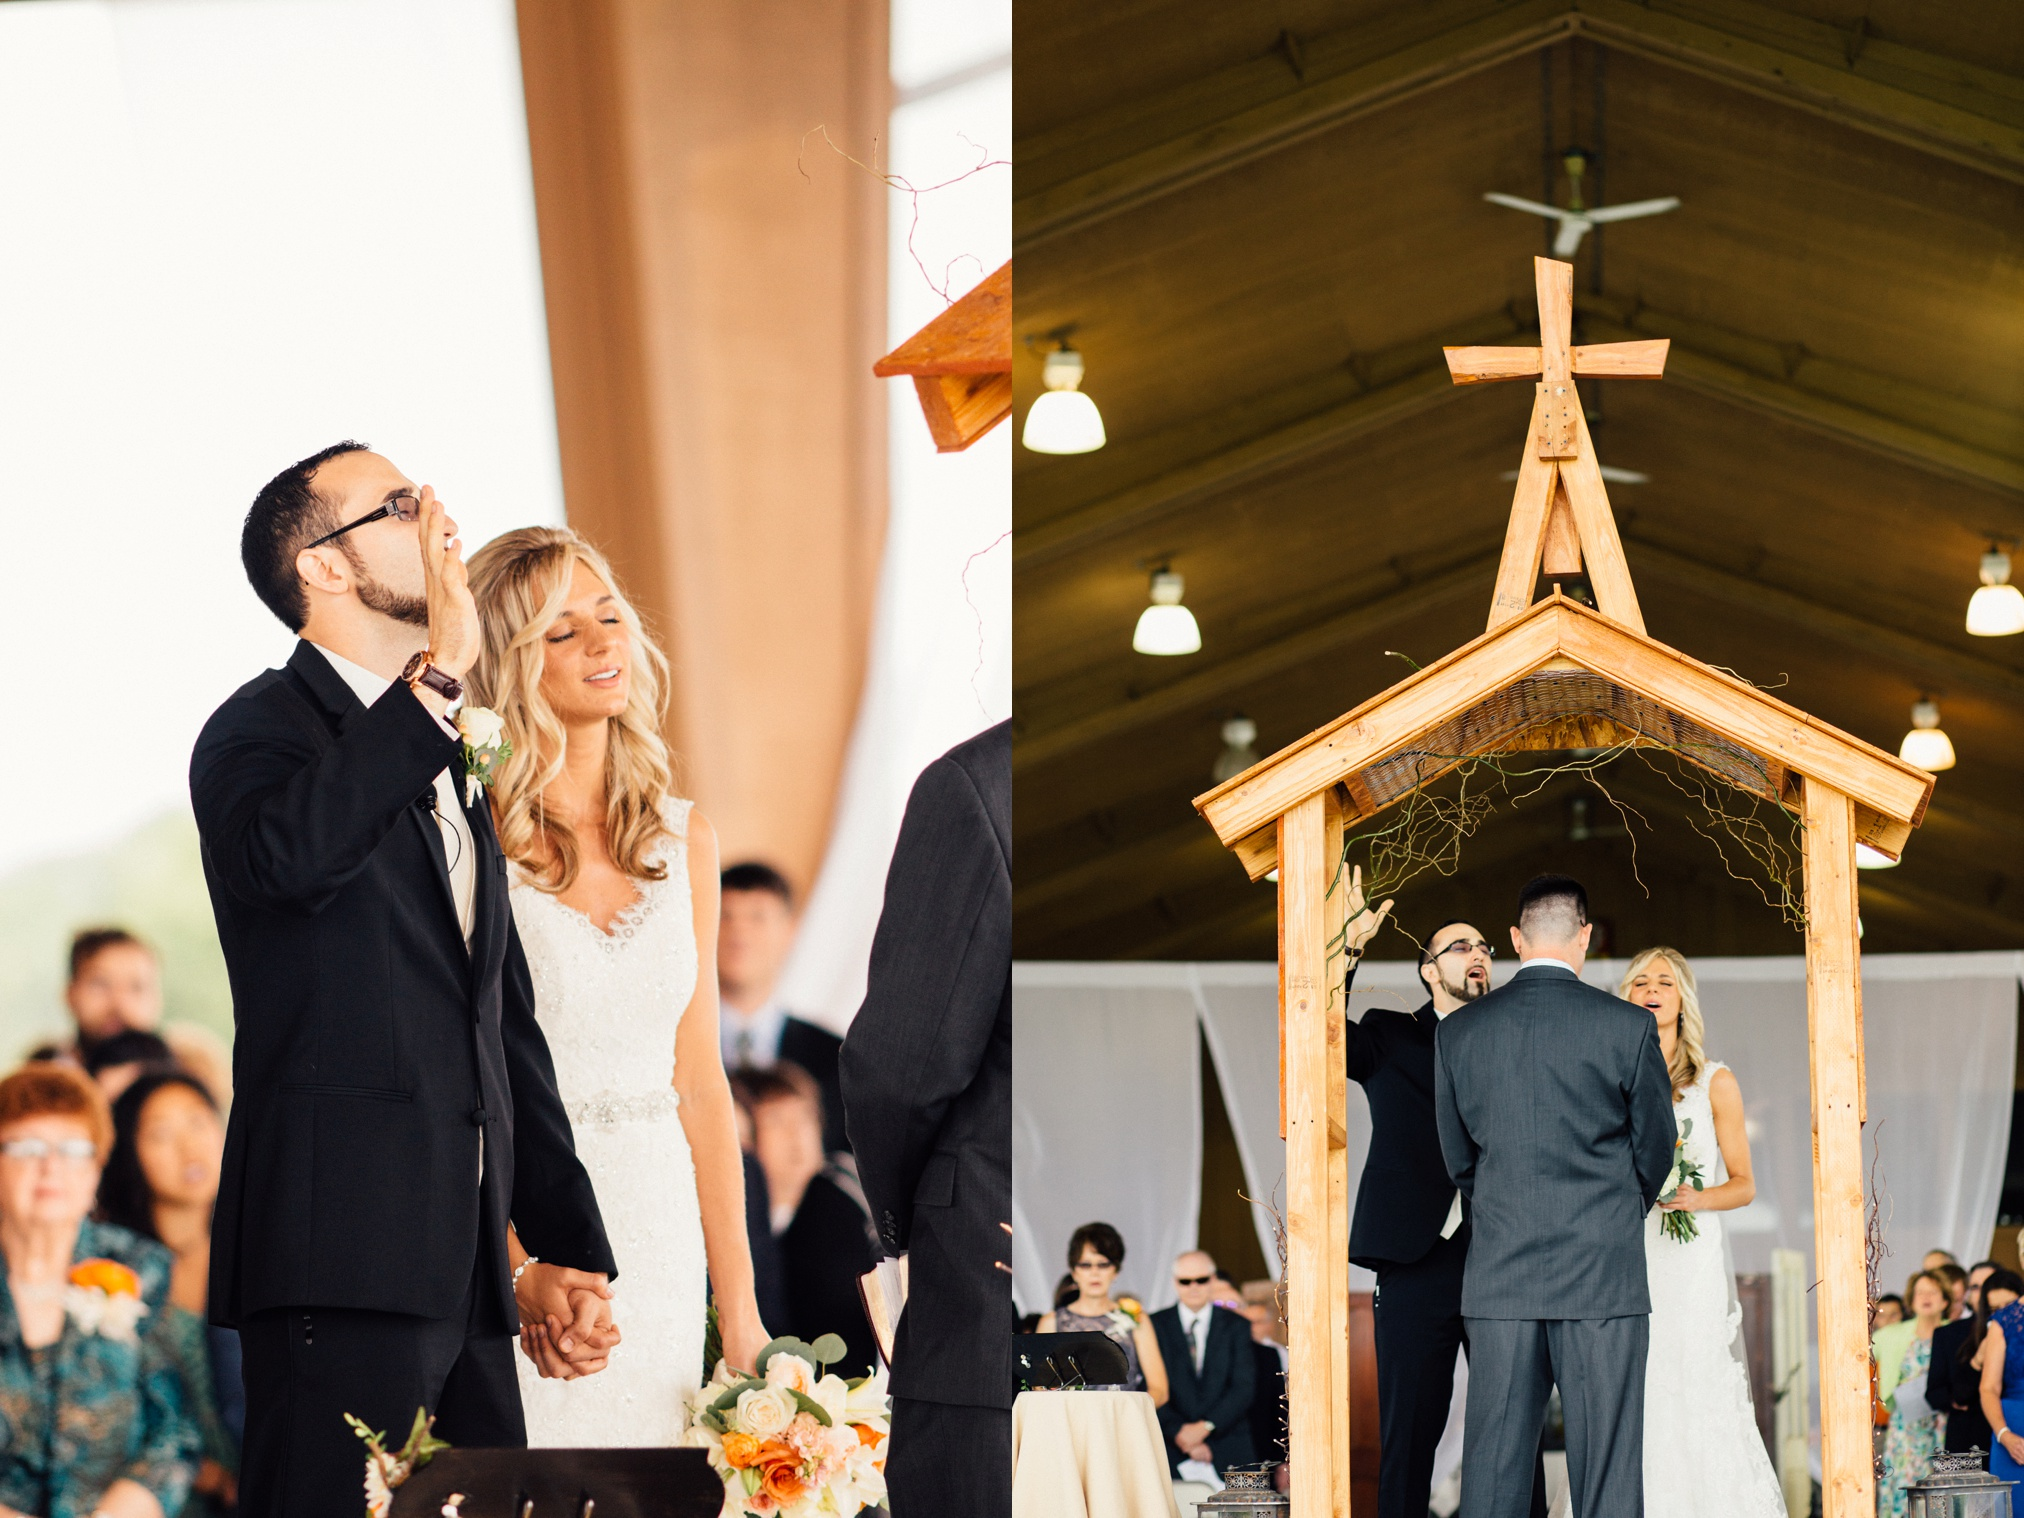 schmid_wedding-451.jpg